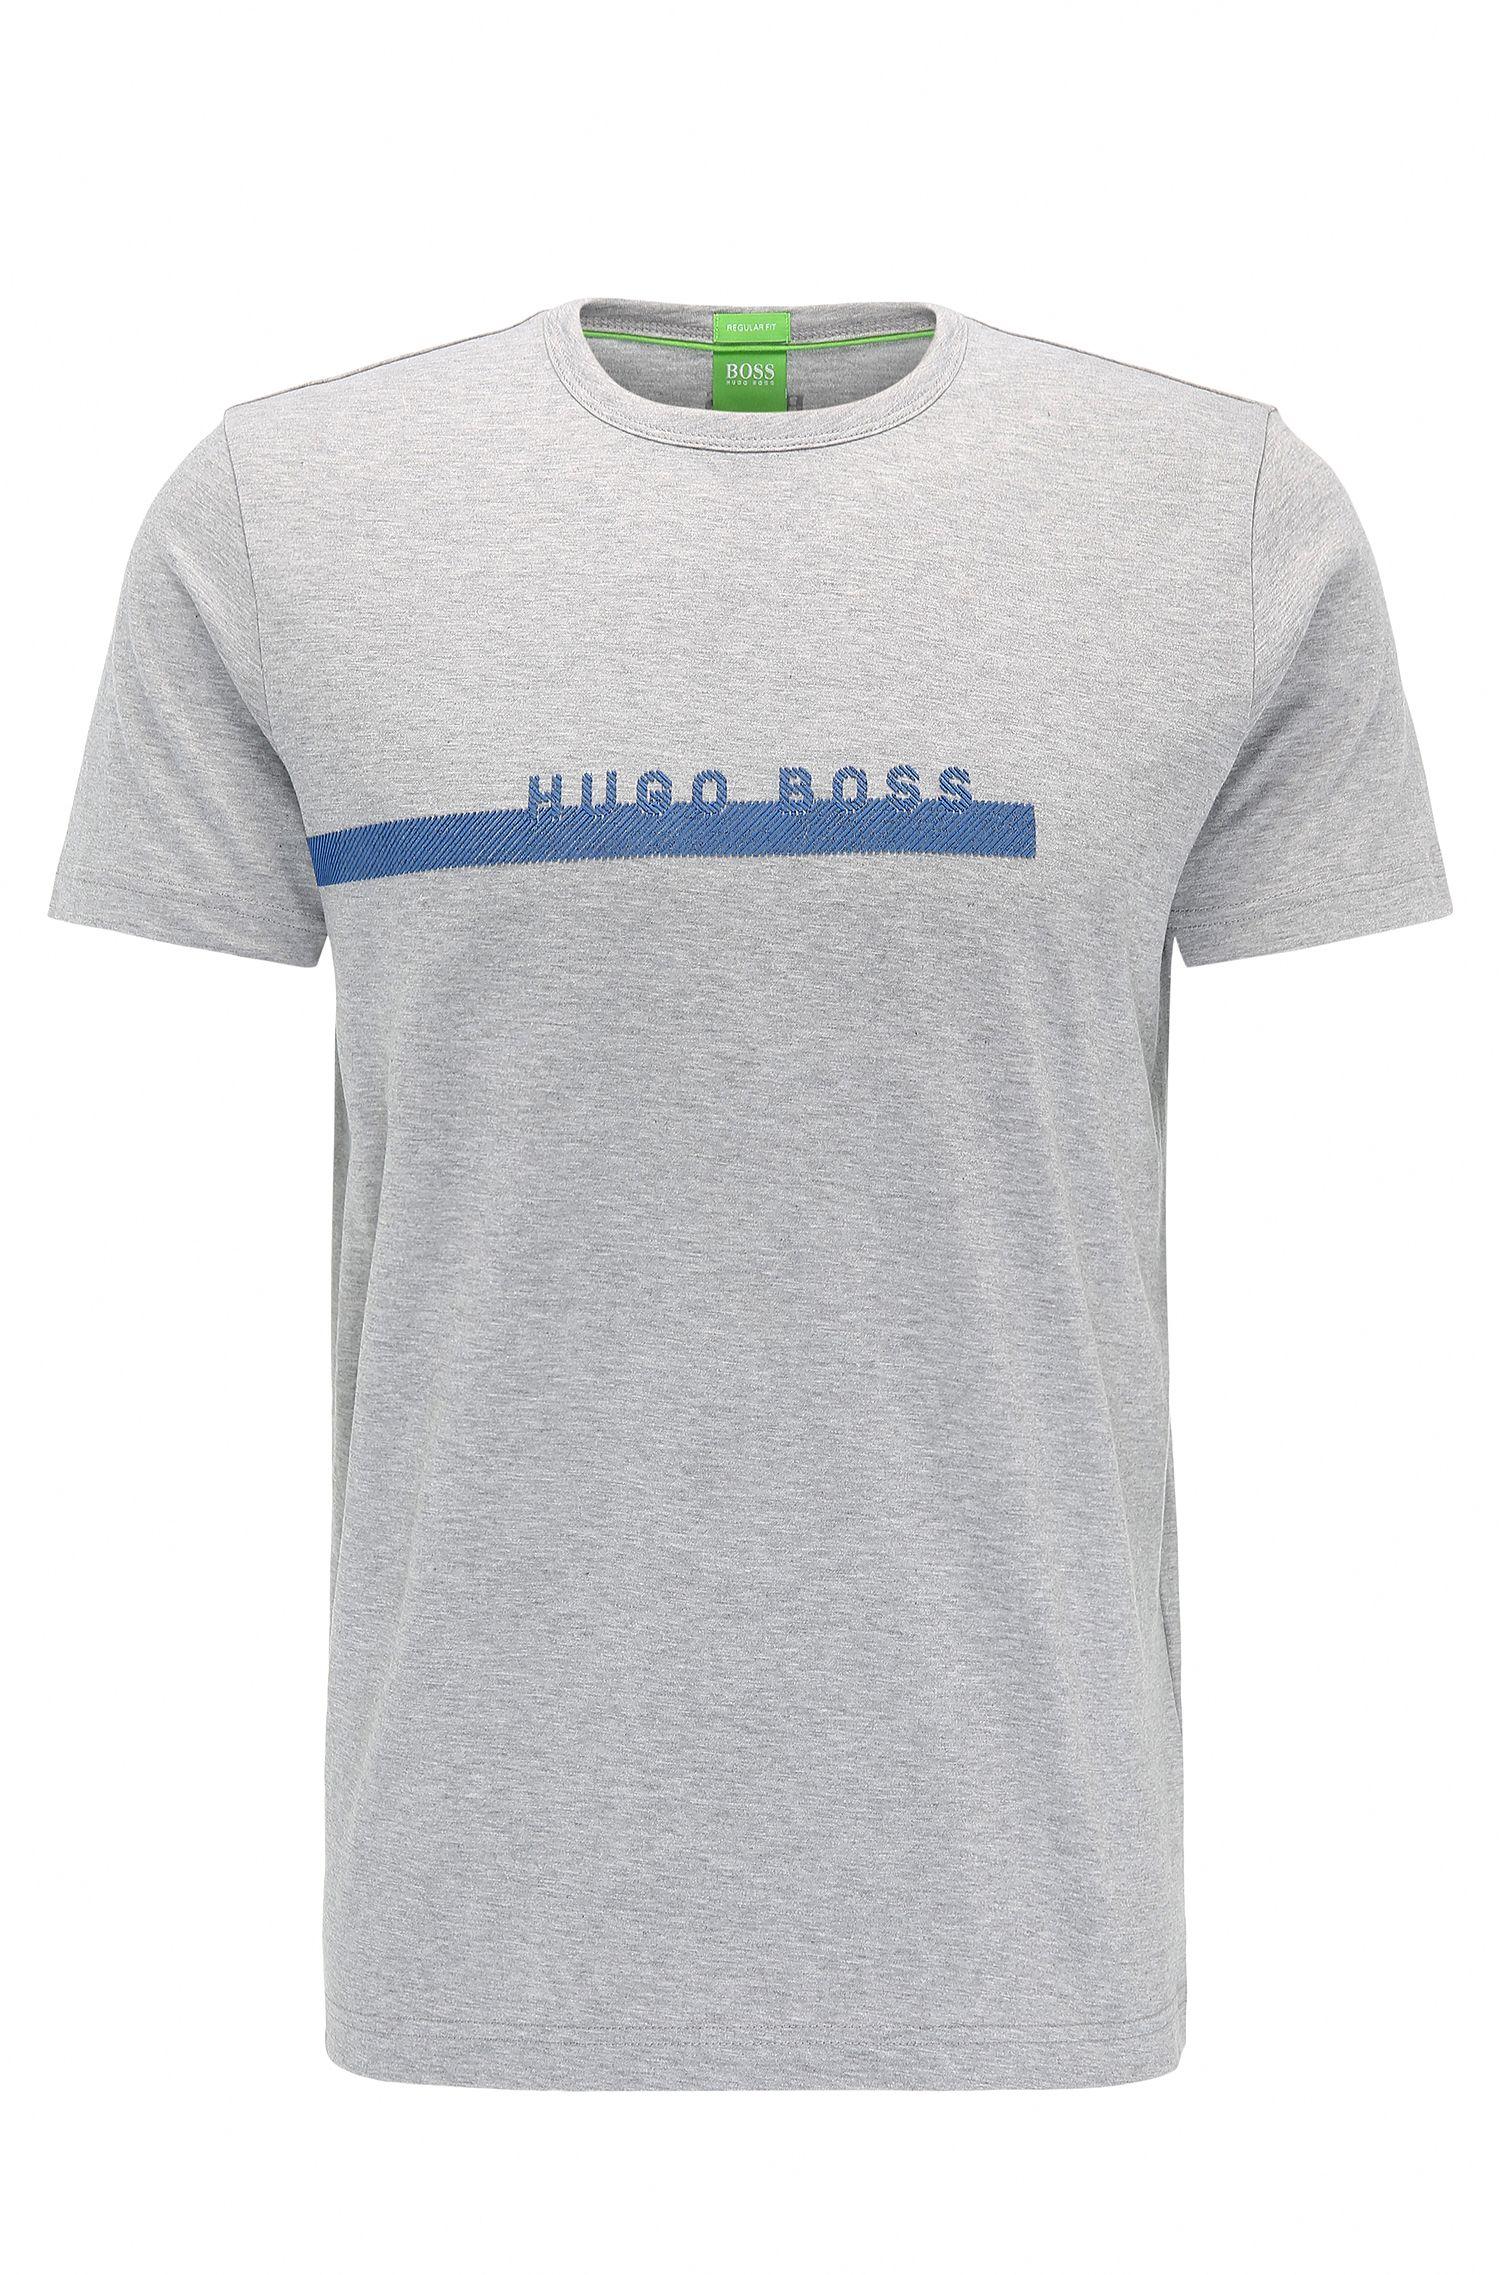 Cotton Jersey Graphic T-Shirt | M-Tee, Light Grey